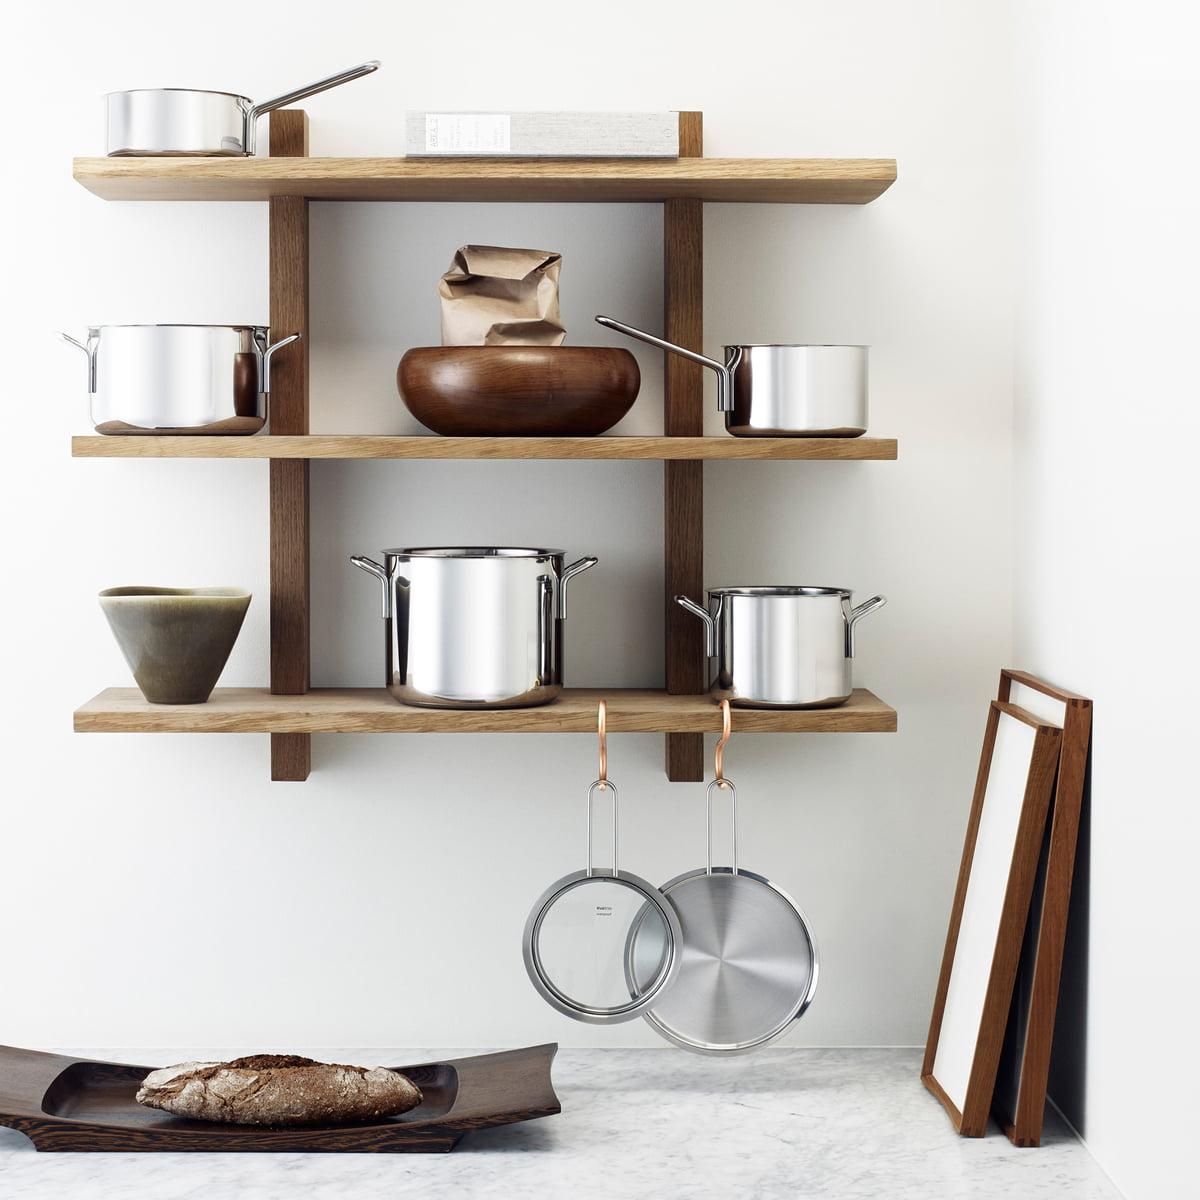 stainless steel topfset von eva trio connox. Black Bedroom Furniture Sets. Home Design Ideas